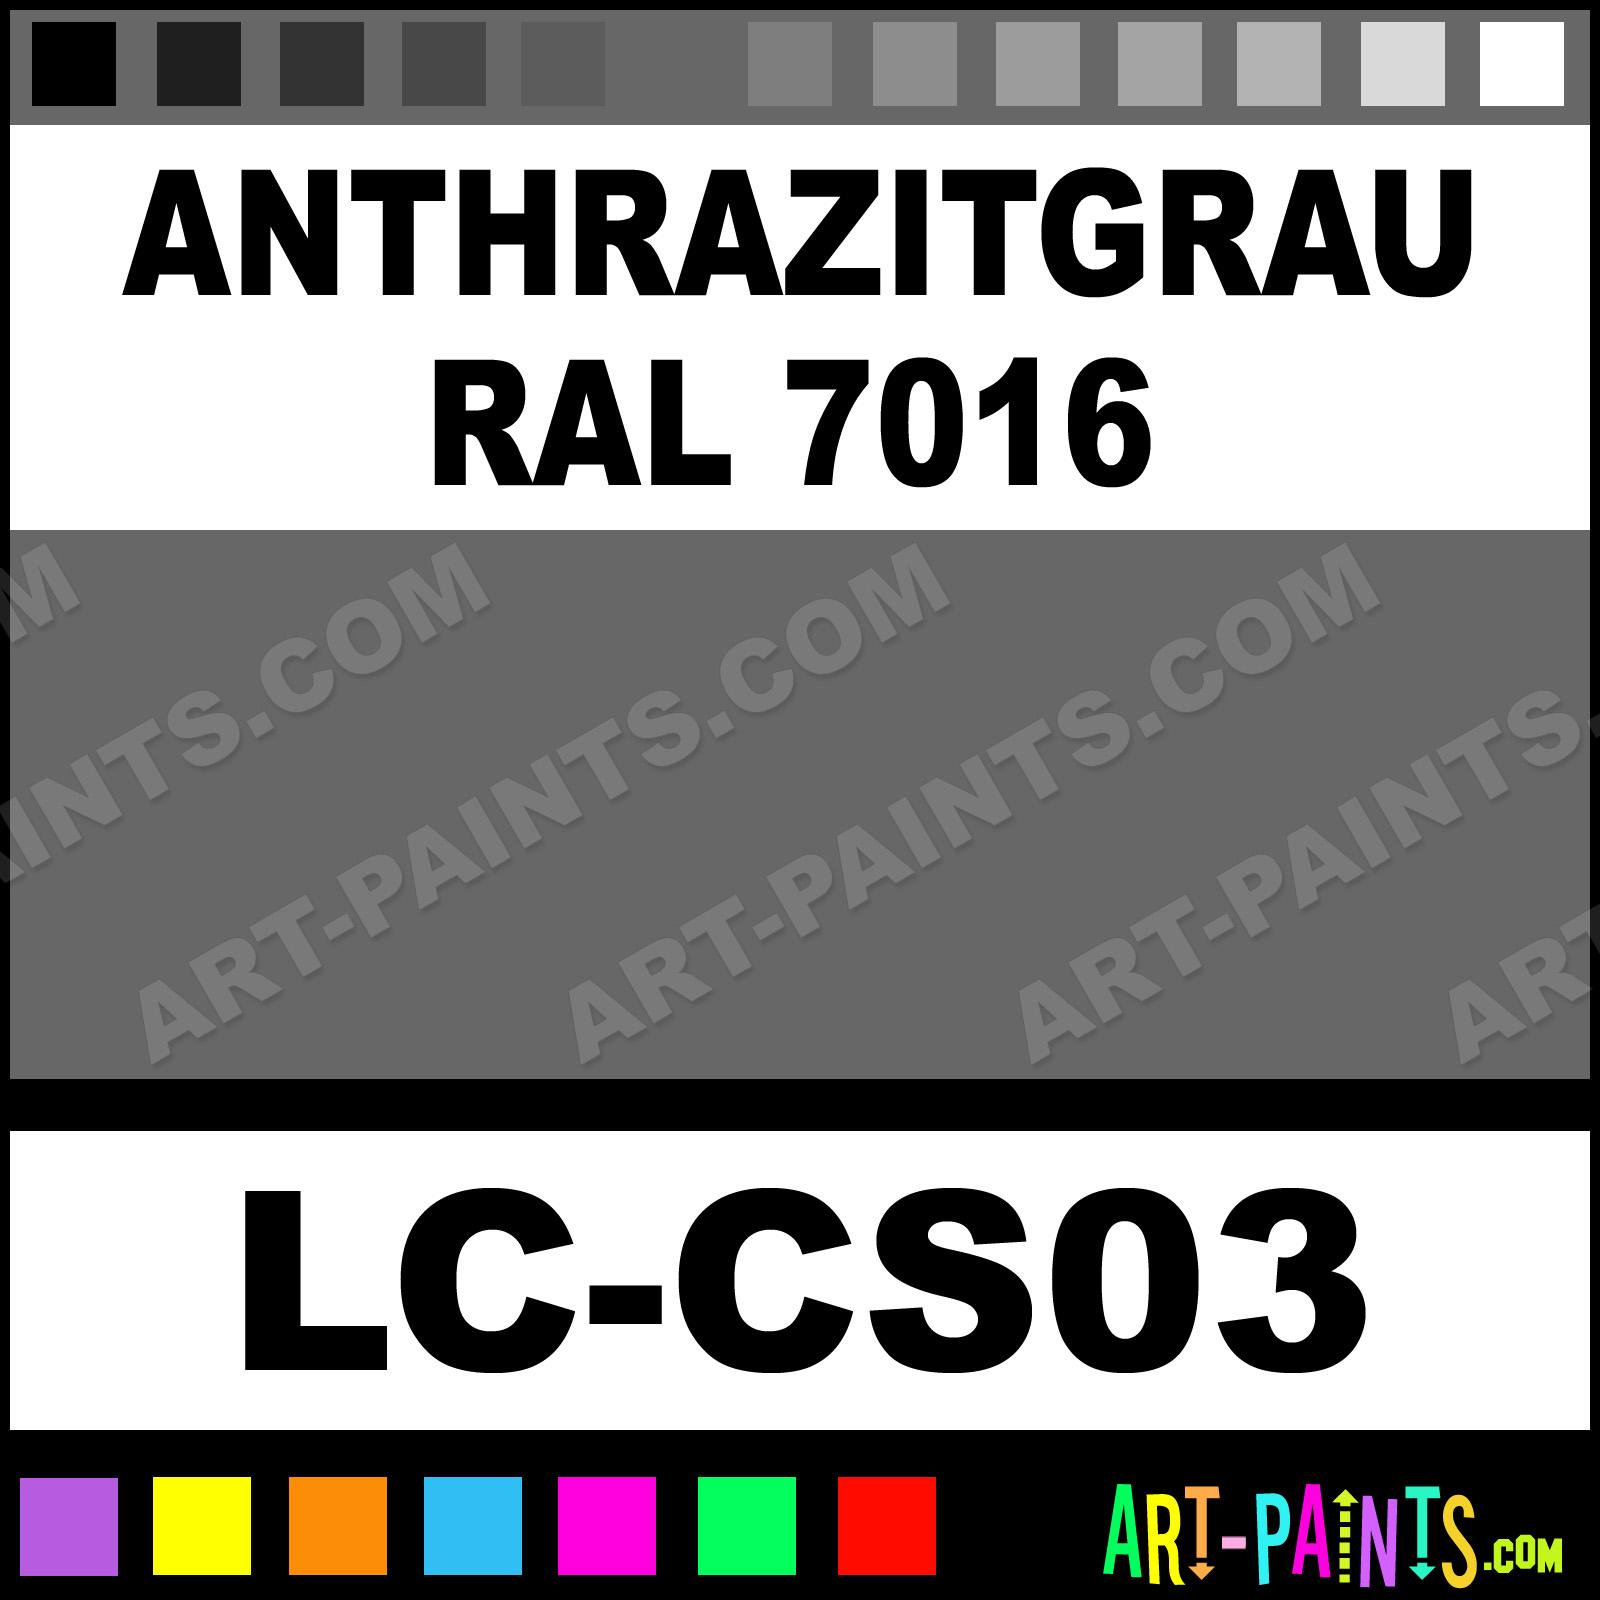 Anthrazitgrau RAL 7016 German Tanks WWII 6 Airbrush Spray Paints ...